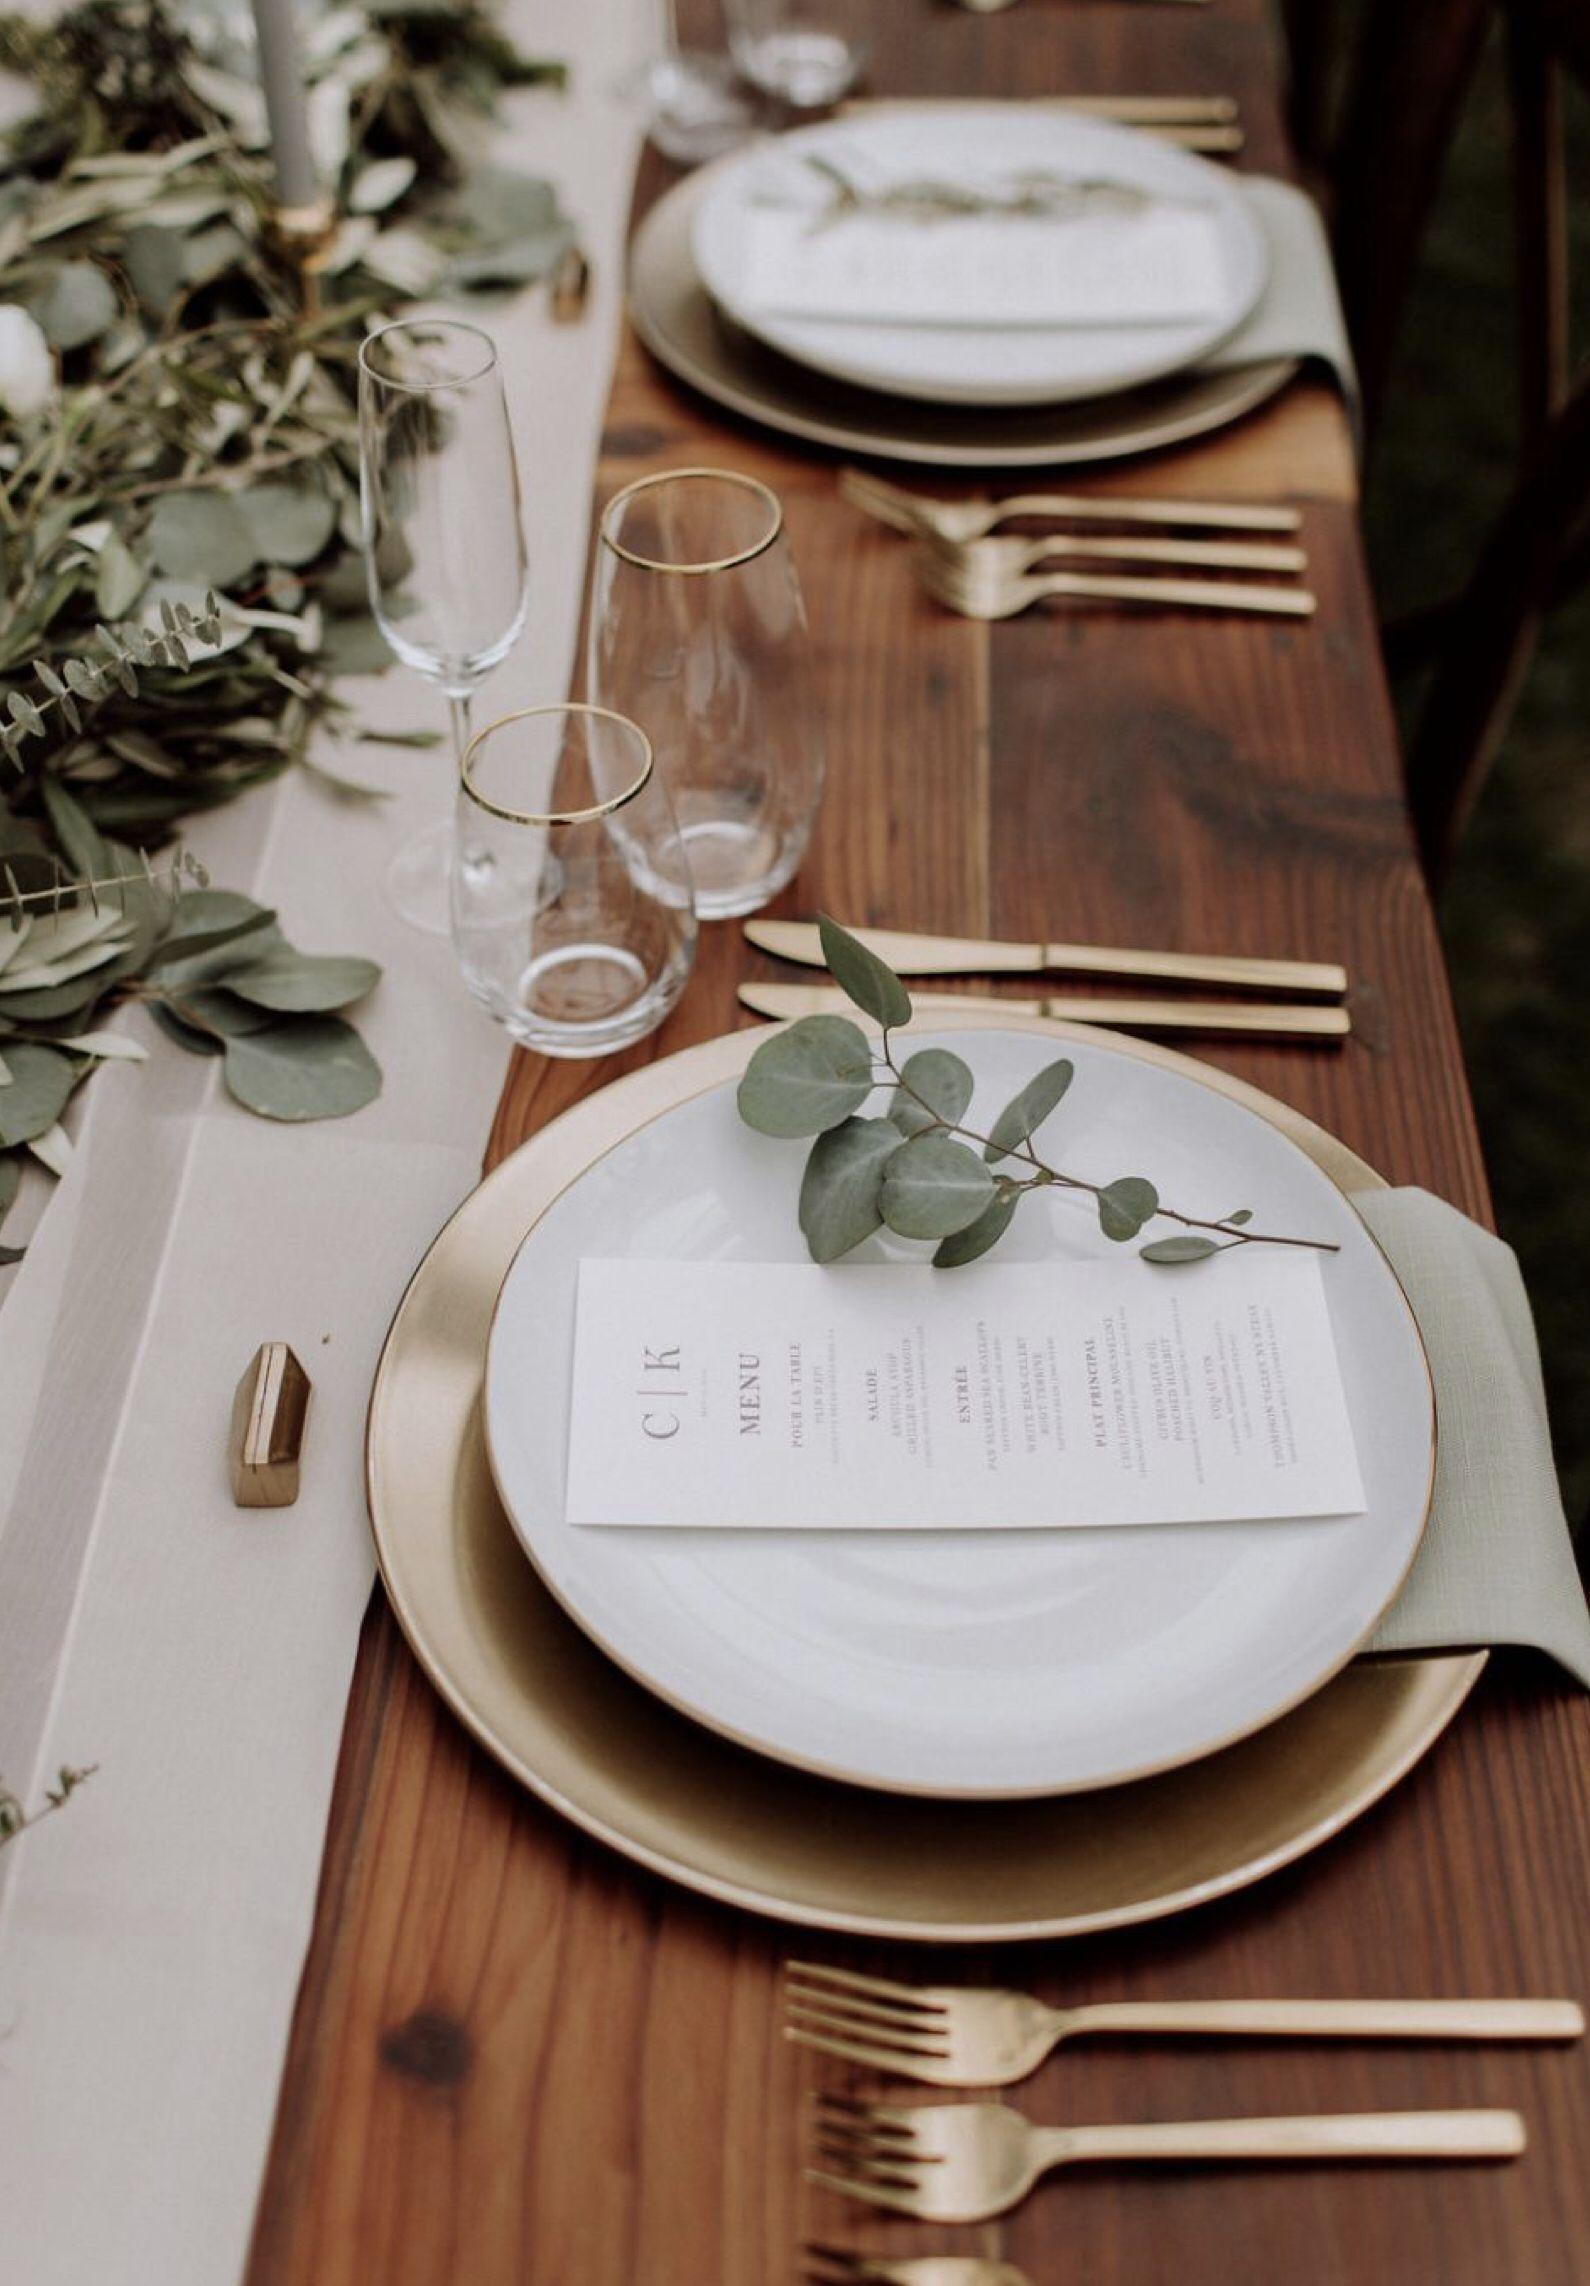 1 lb Jumbo Bunch - Fresh Silver Dollar Eucalyptus Sprigs - Wedding Greenery Bridal Bouquets Wedding Centerpieces Wedding Runners Springs